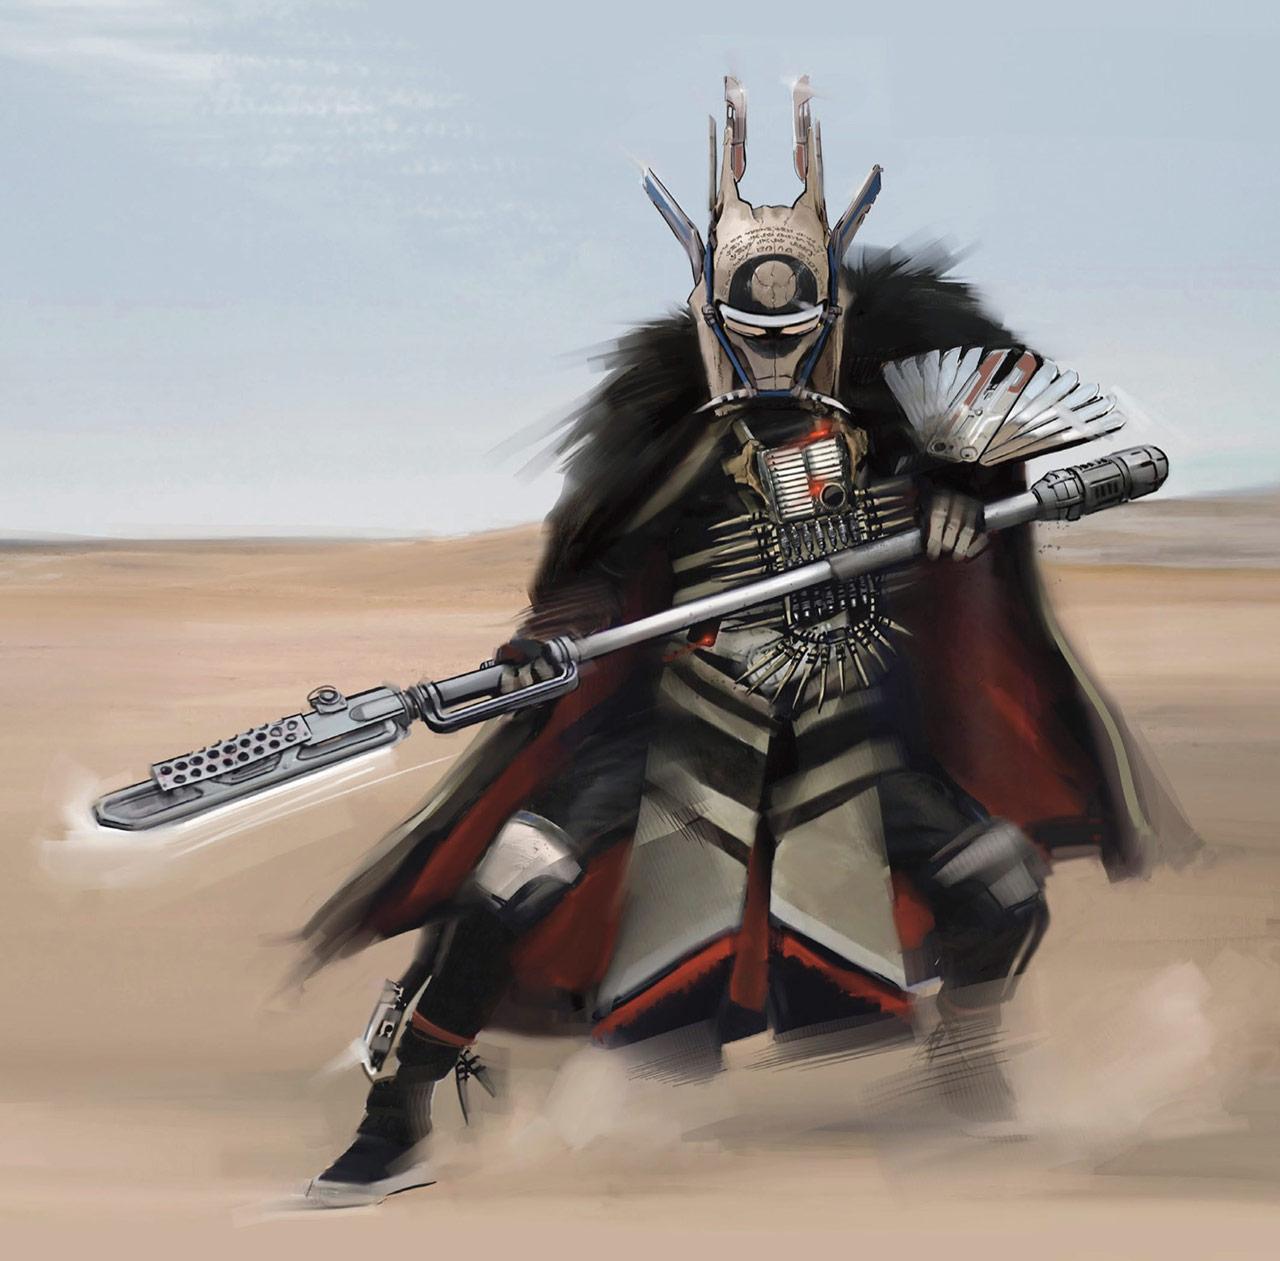 Original Star Wars Character Concept Art